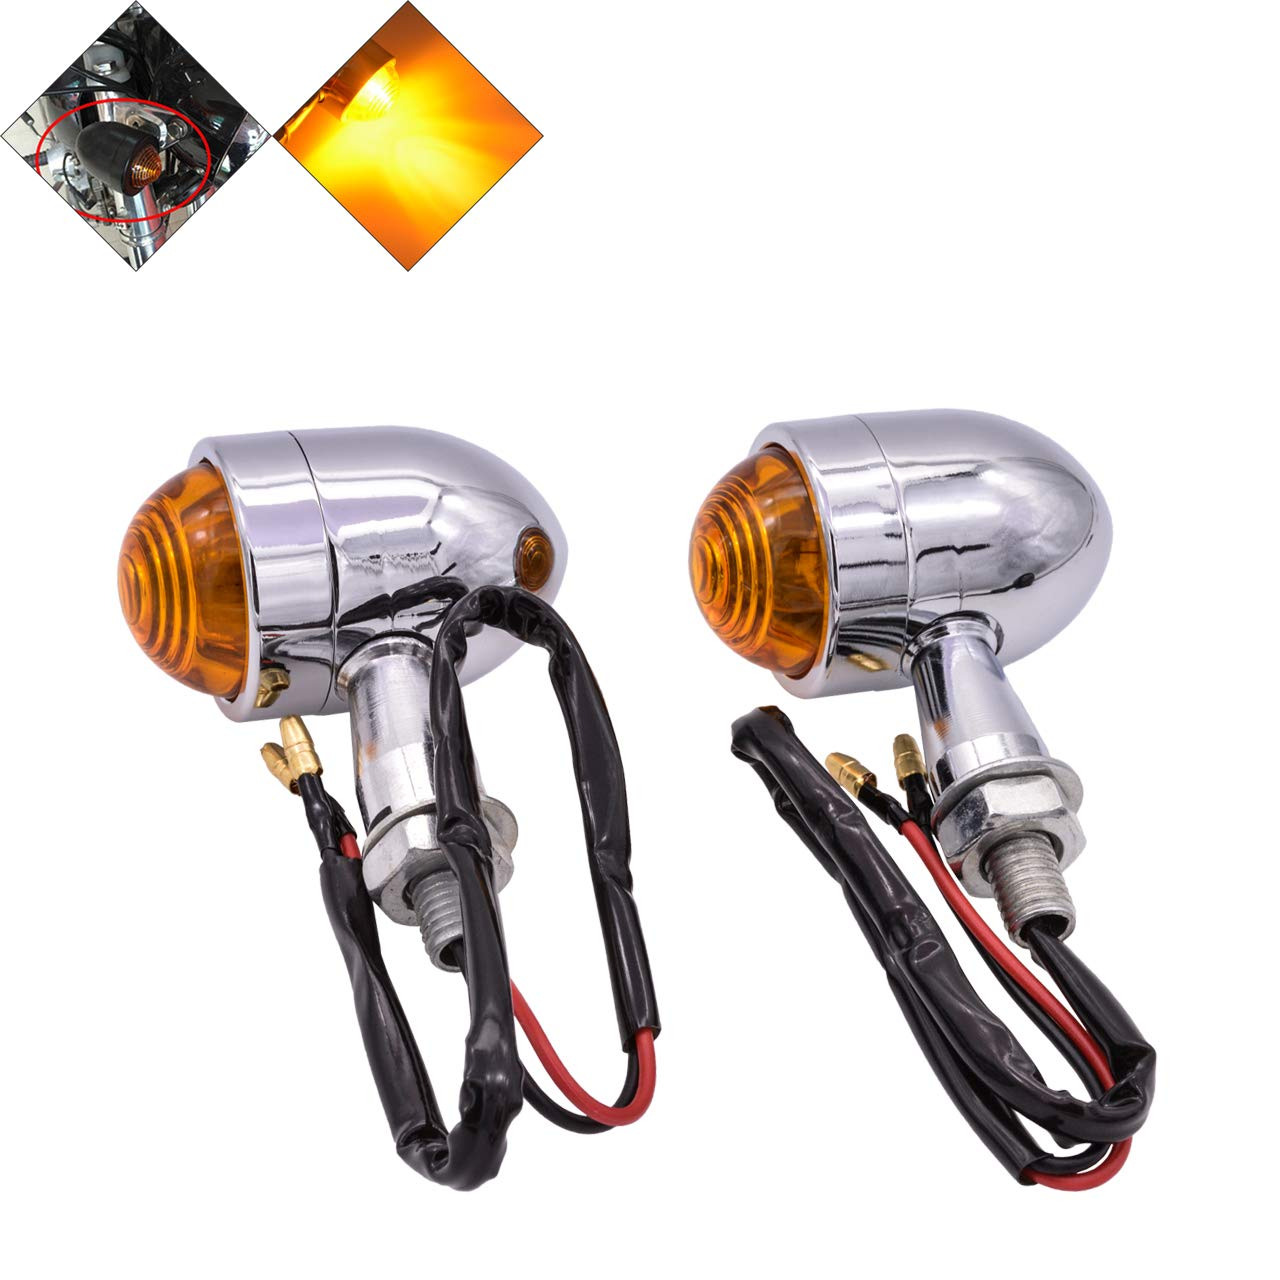 CICMOD 2pcs 12V Motorbike Indicators Flowing Motorcycle LED Turn Signal Lights Universal for Harley Kawasaki Yamaha